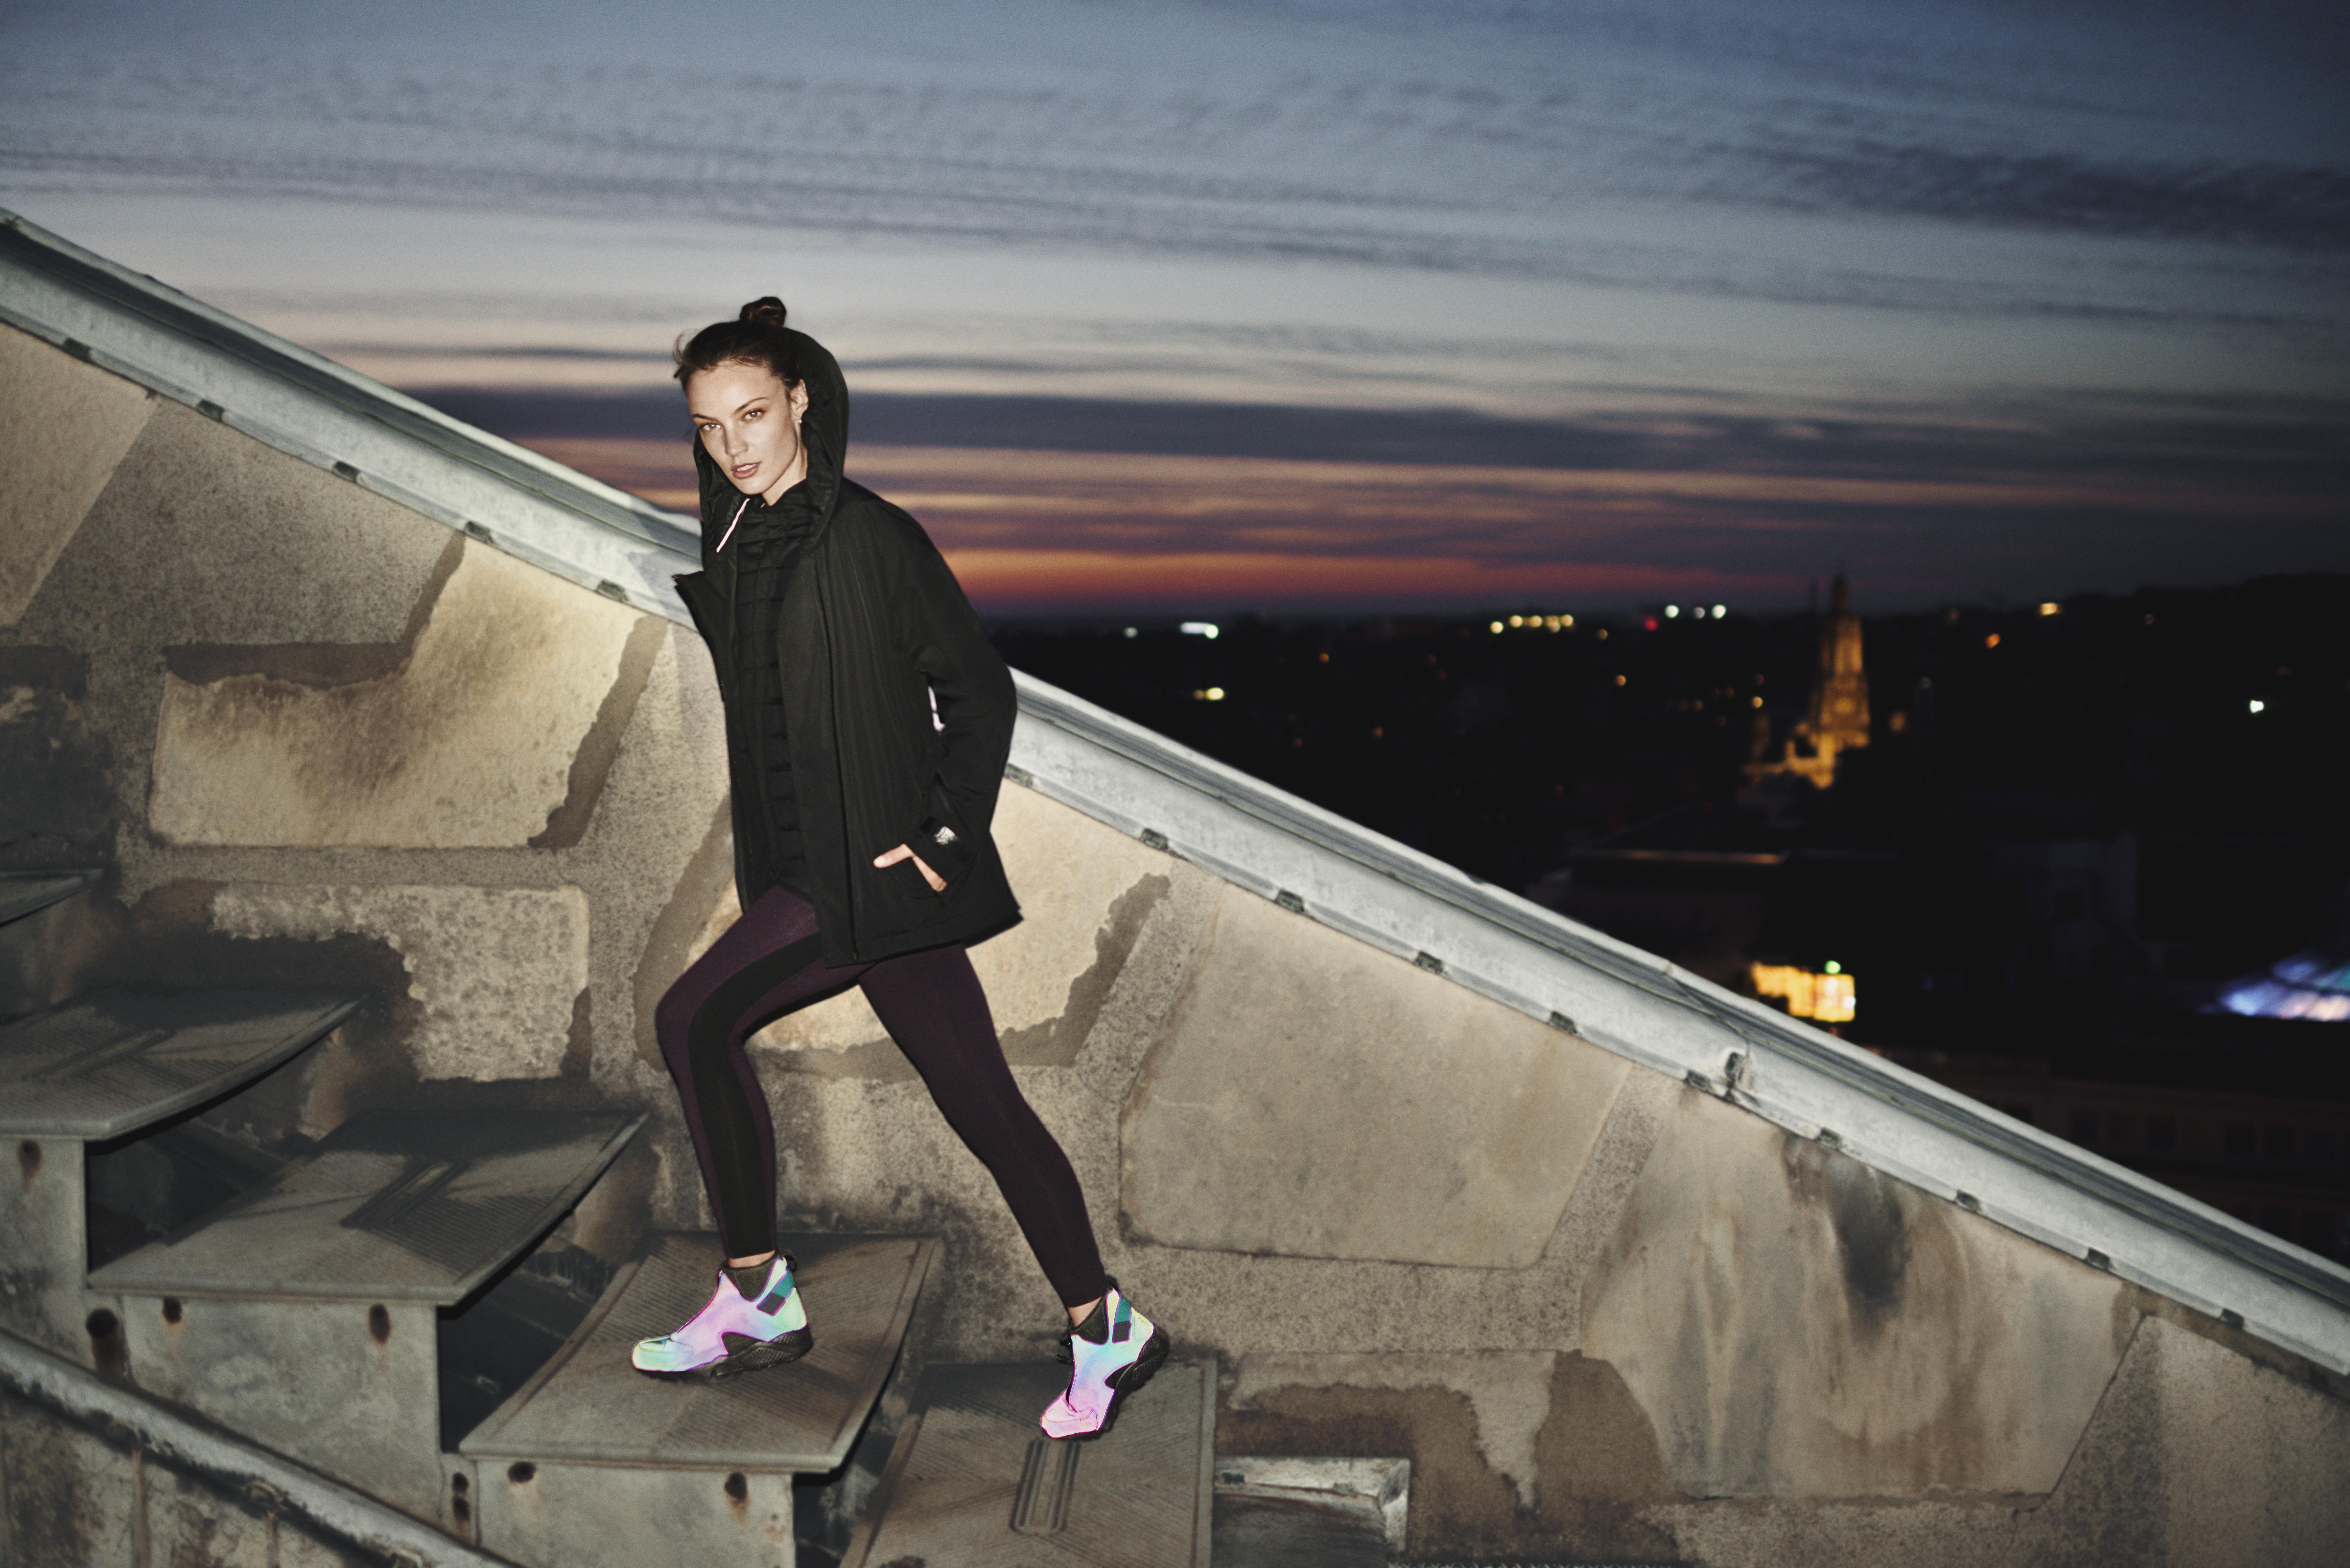 nike shox prime d'éclat - Nike News - Sometimes More Is More: The Women's Air Huarache Run Mid